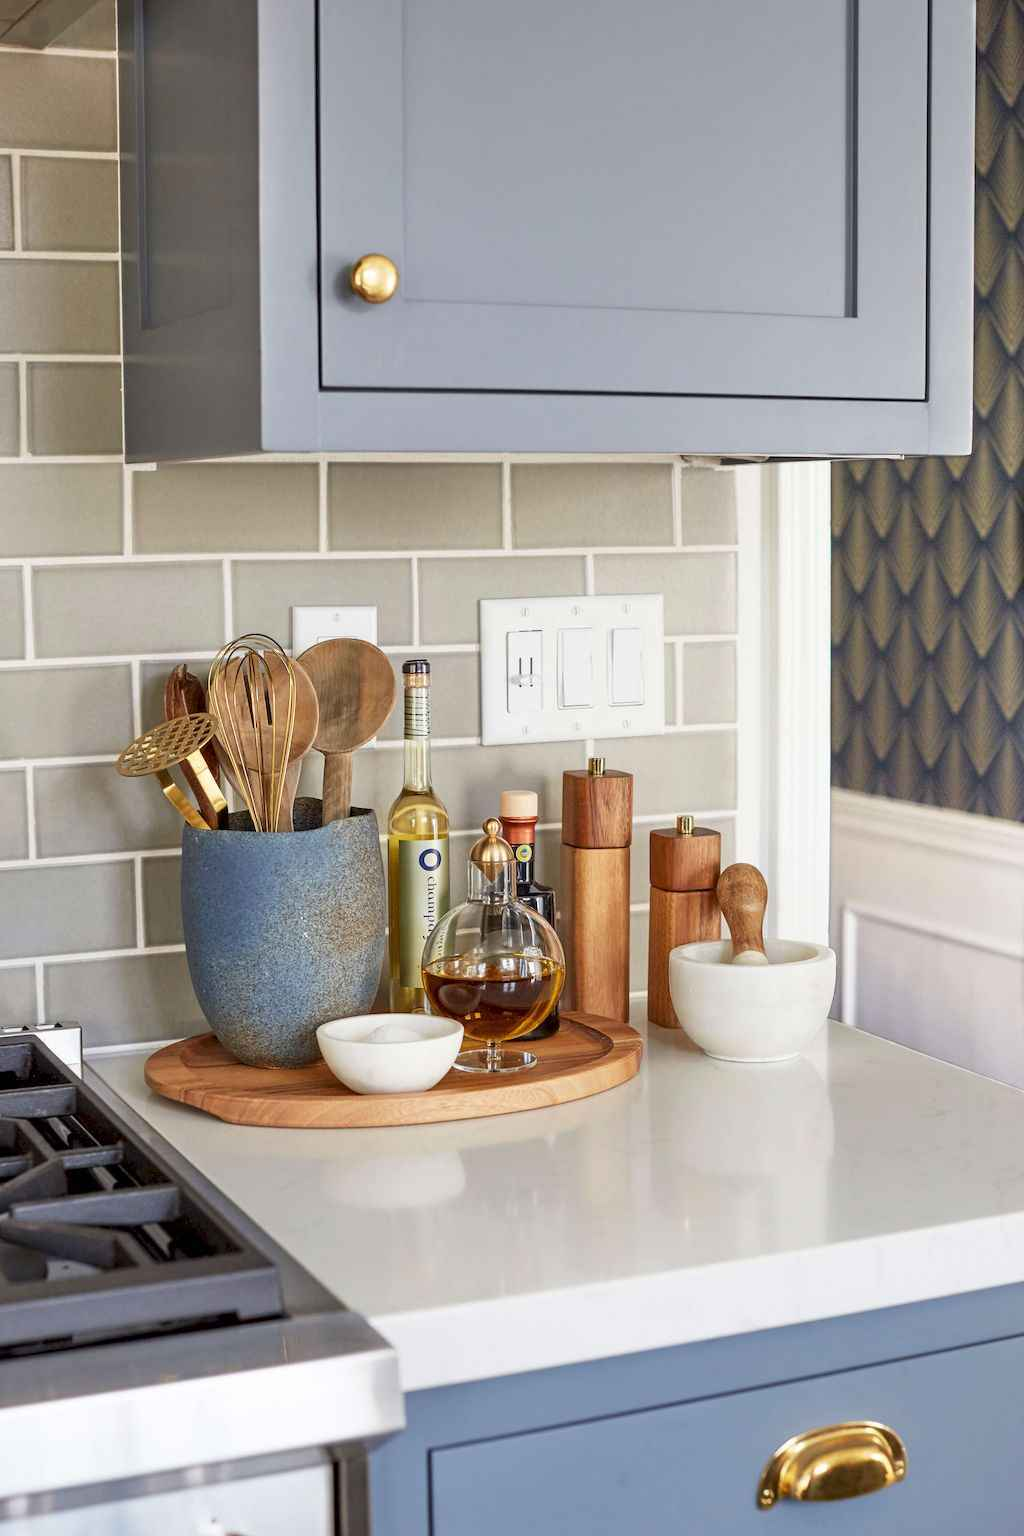 70 cool modern apartment kitchen decor ideas 60 for 70s kitchen ideas